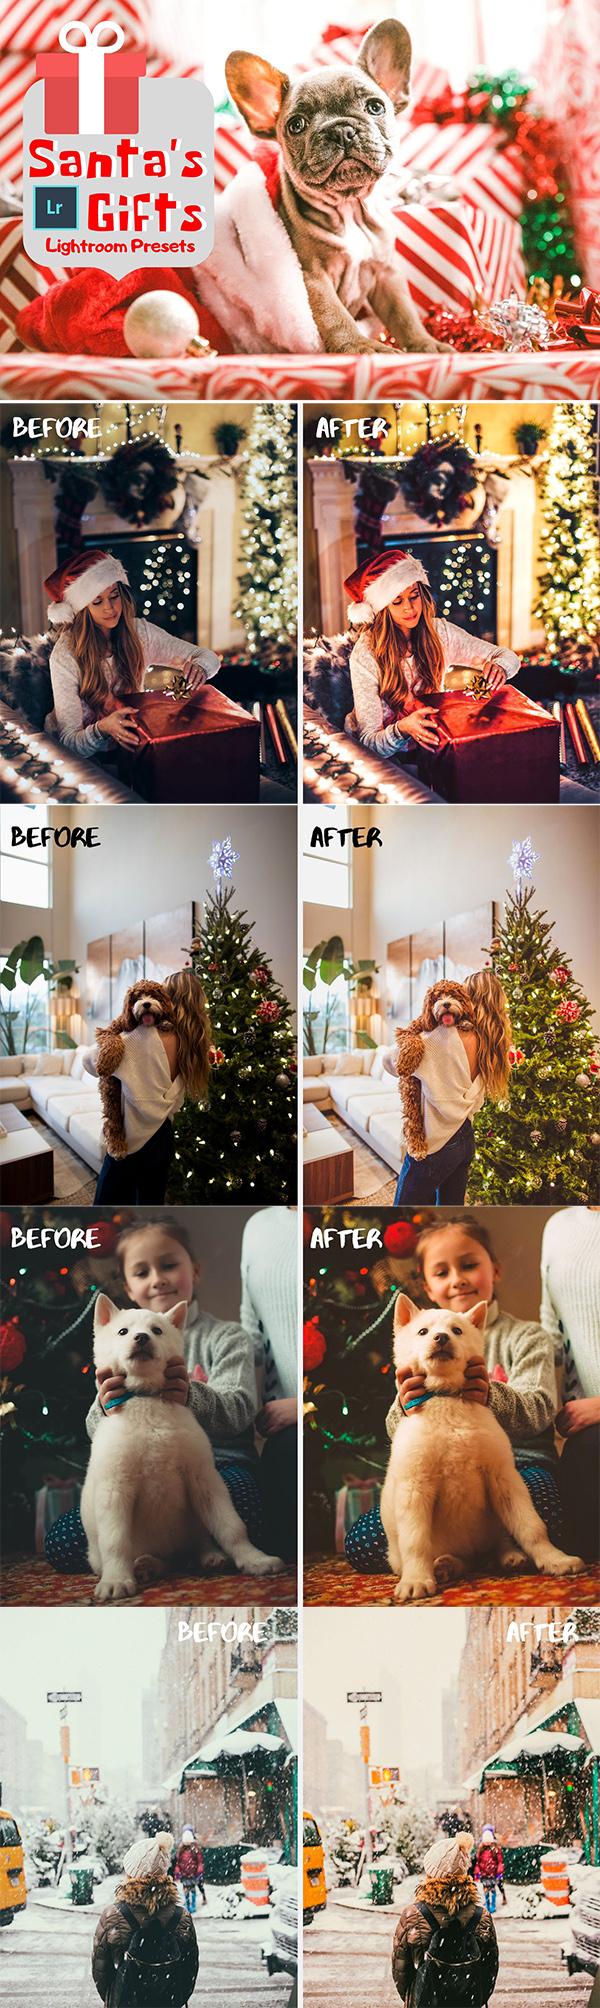 Free Santa's Gifts Lightroom Presets